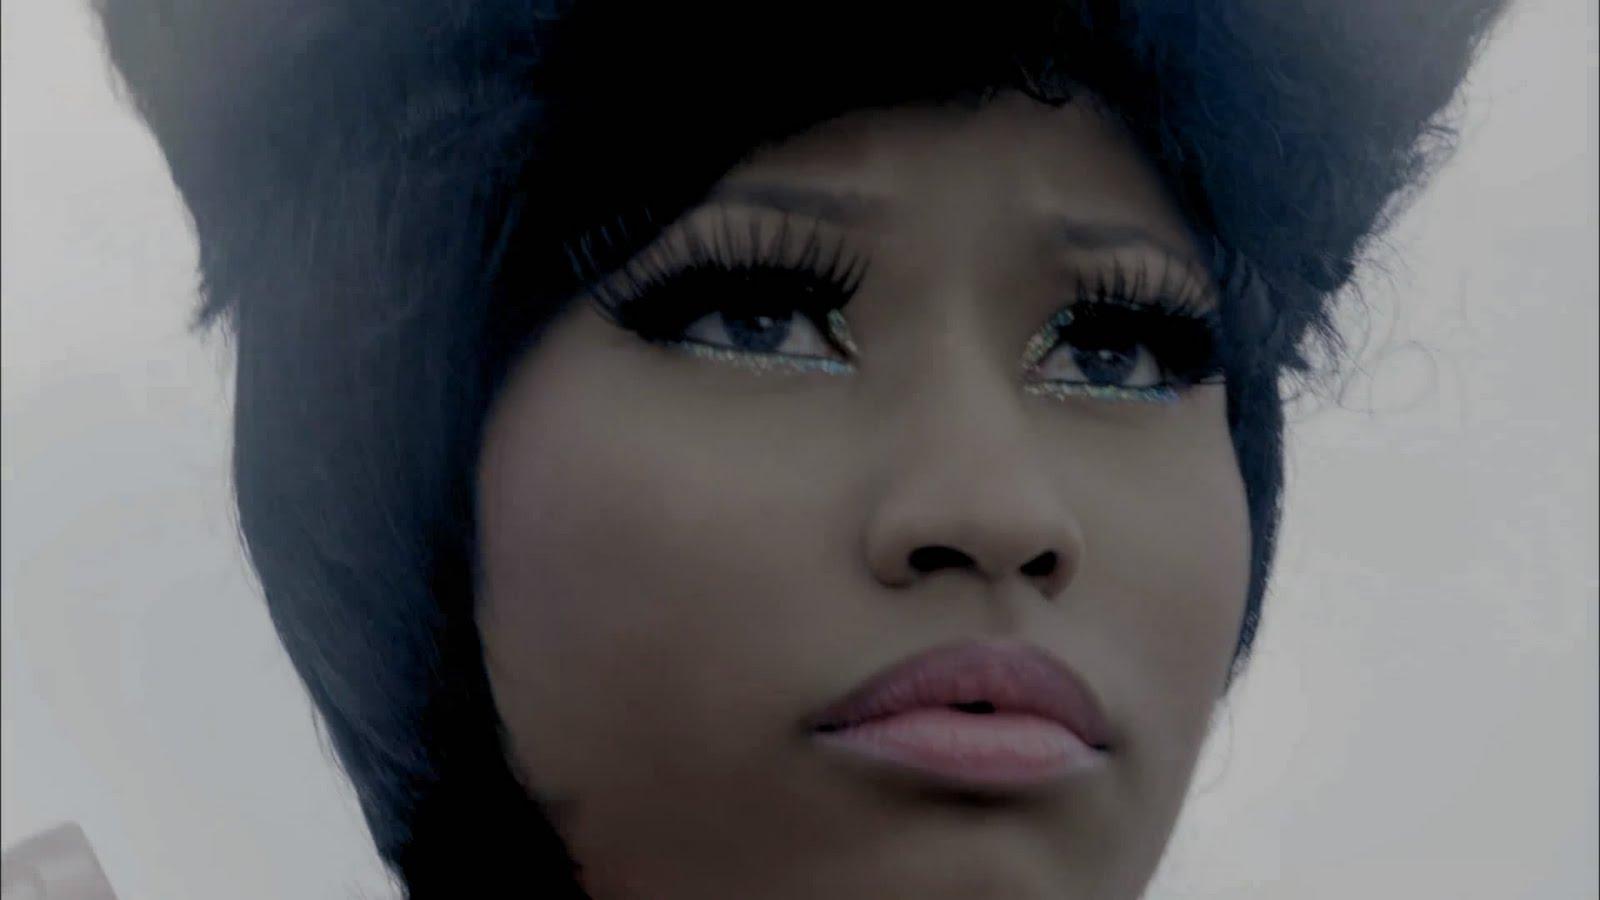 http://4.bp.blogspot.com/-XG38NXIlrdg/TmFKq_3pZlI/AAAAAAAAD0U/AMFzhJjXV38/s1600/Nicki+Minaj+Feat.+Rihanna+-+Fly.mp4_snapshot_00.48_%255B2011.09.02_18.11.17%255D.jpg